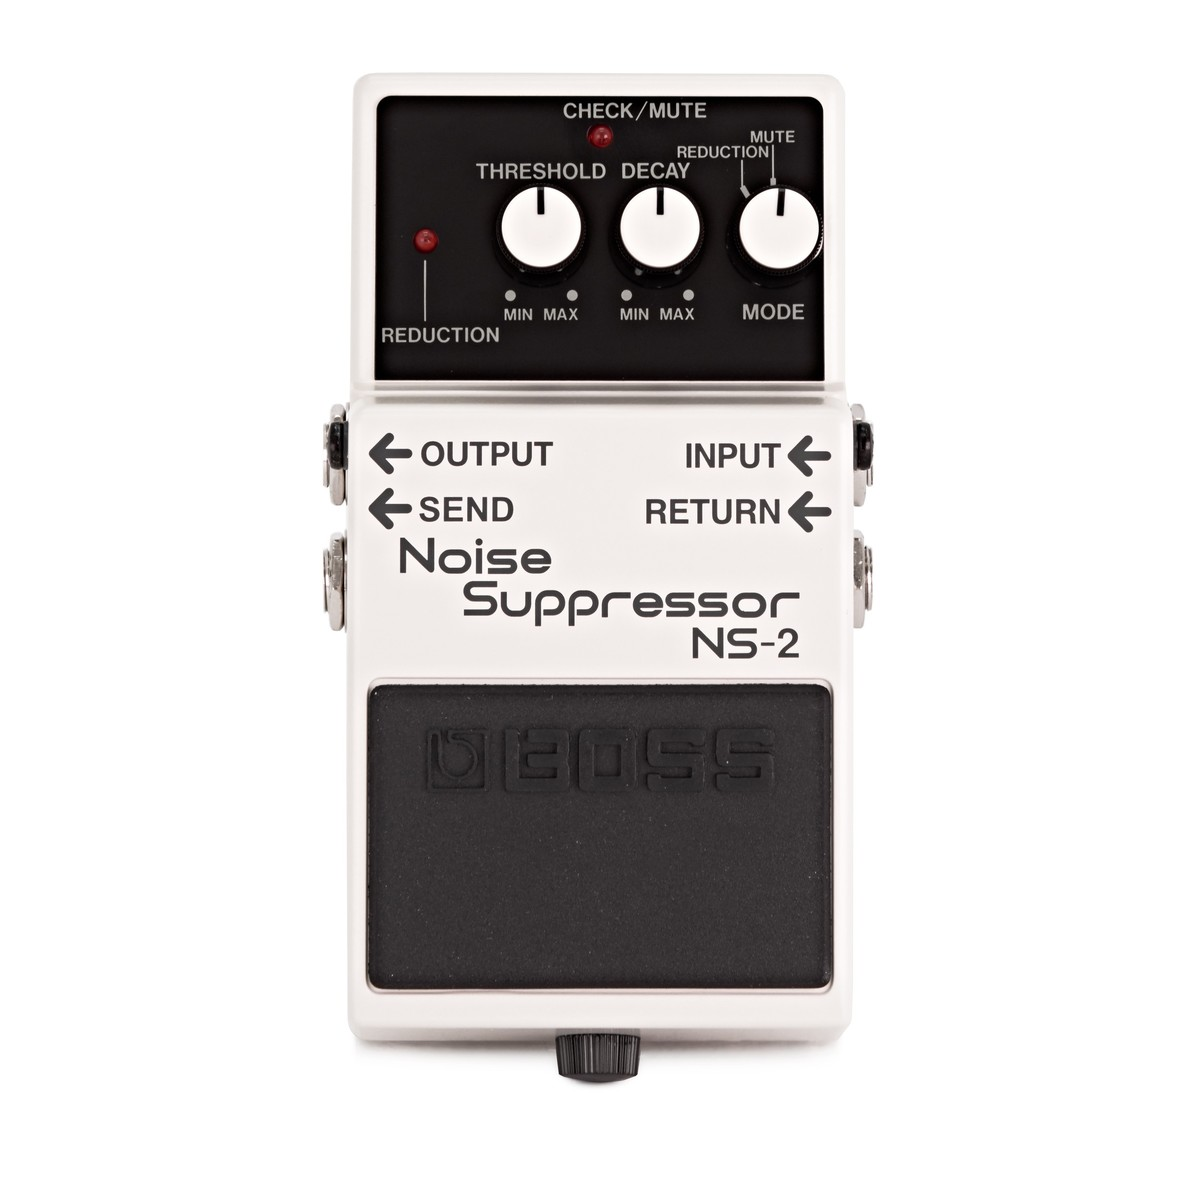 boss ns 2 noise suppressor guitar pedal at gear4music. Black Bedroom Furniture Sets. Home Design Ideas